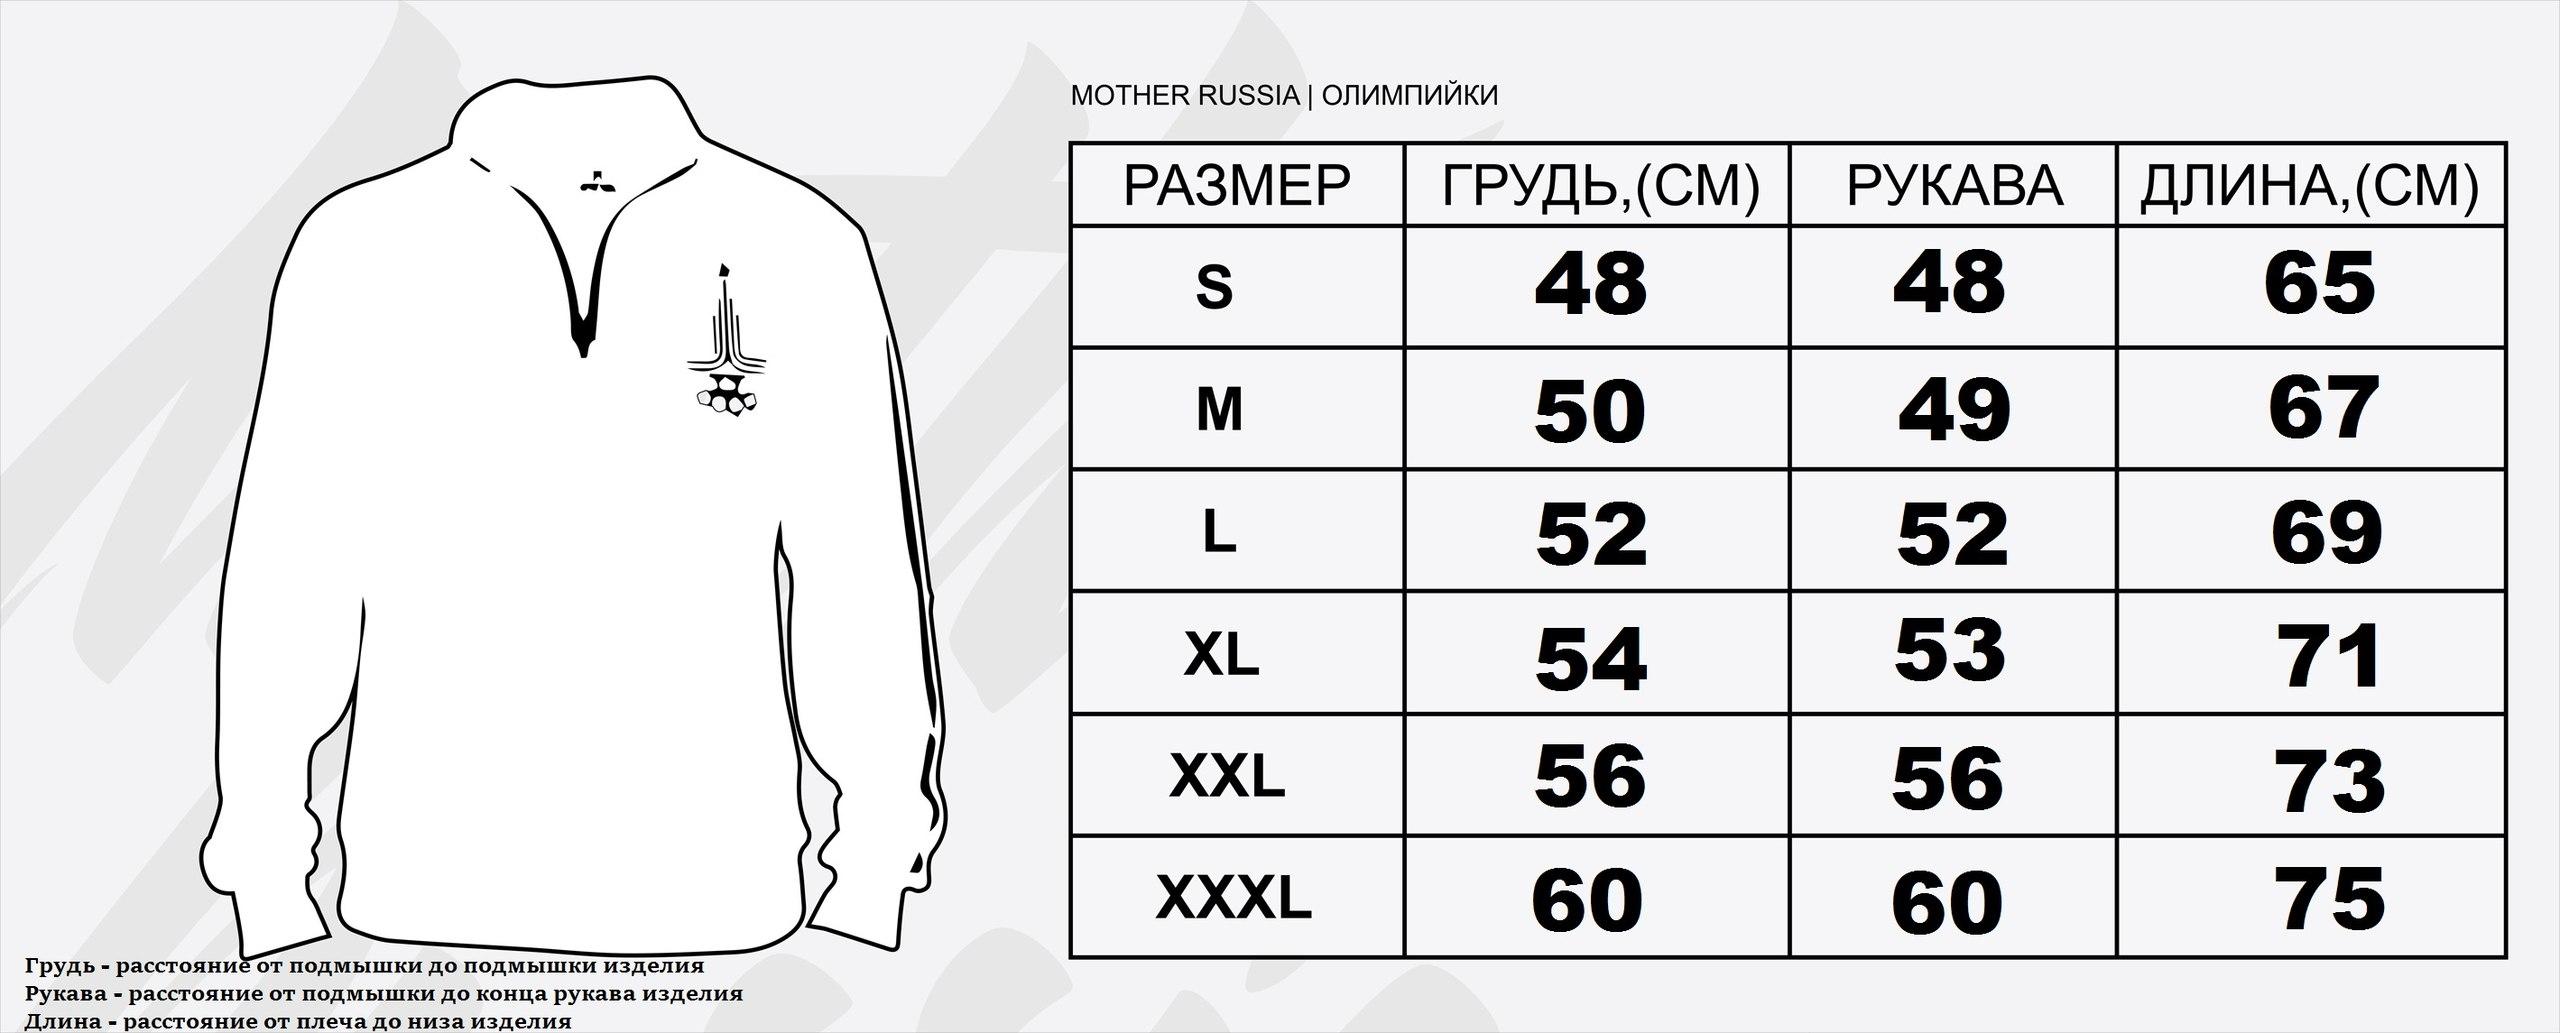 https://static-eu.insales.ru/files/1/3333/5377285/original/Олимпийки_размеры.jpg